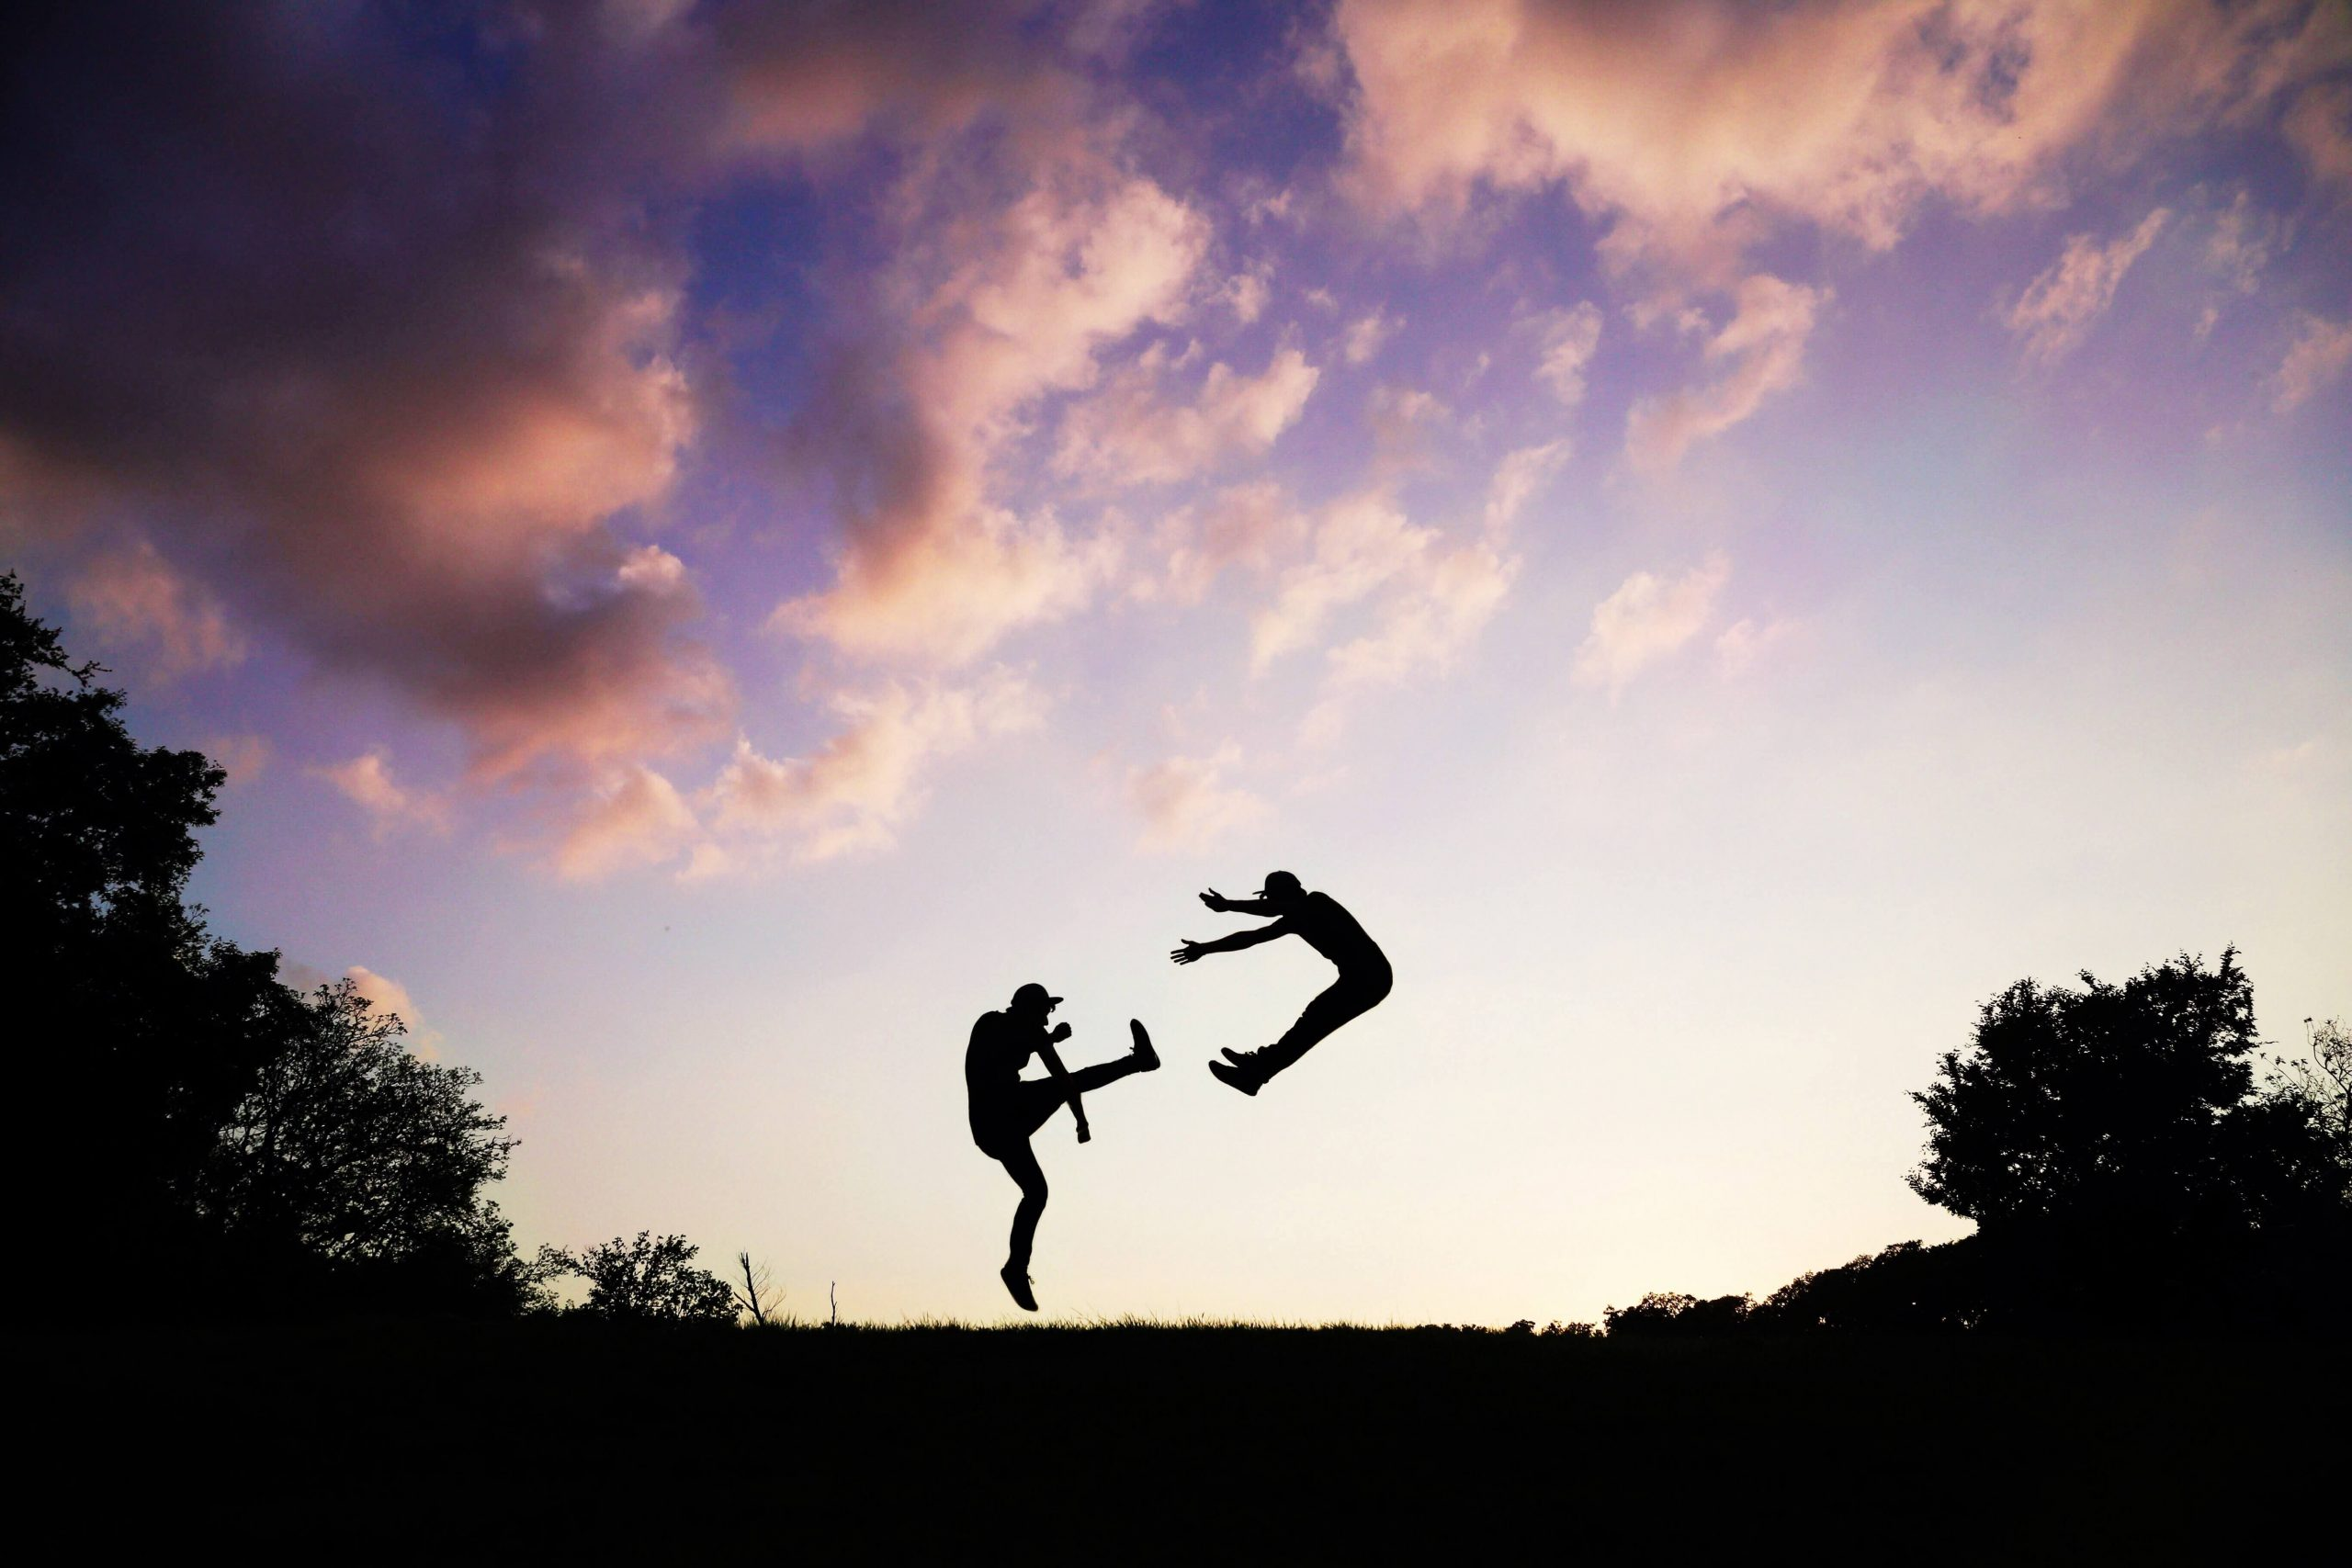 2-people-doing-karate-during-sunset-62376 (1)